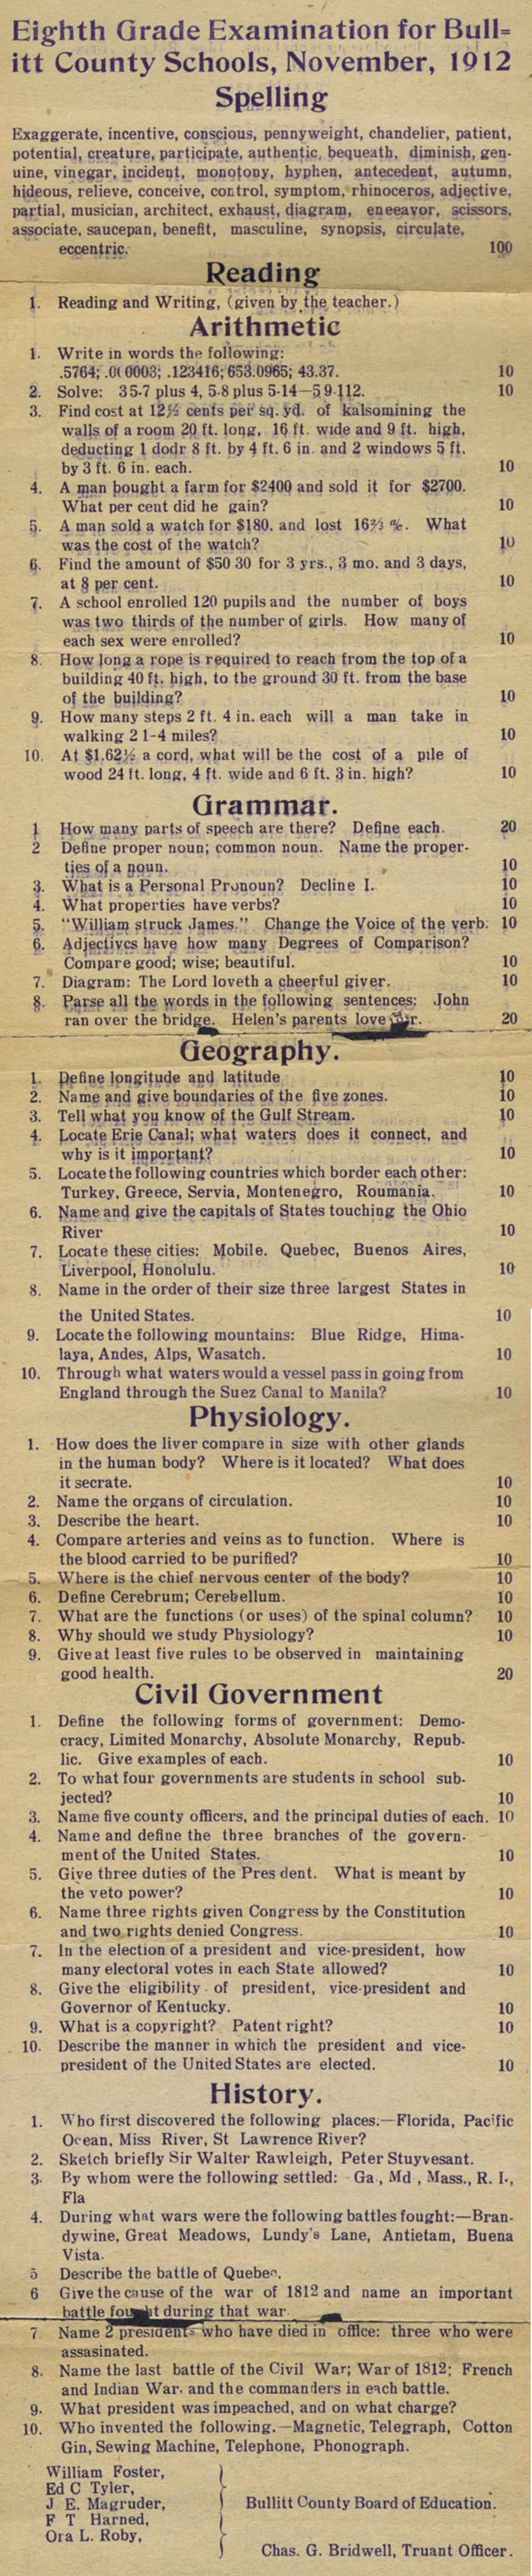 1912 8th grade test